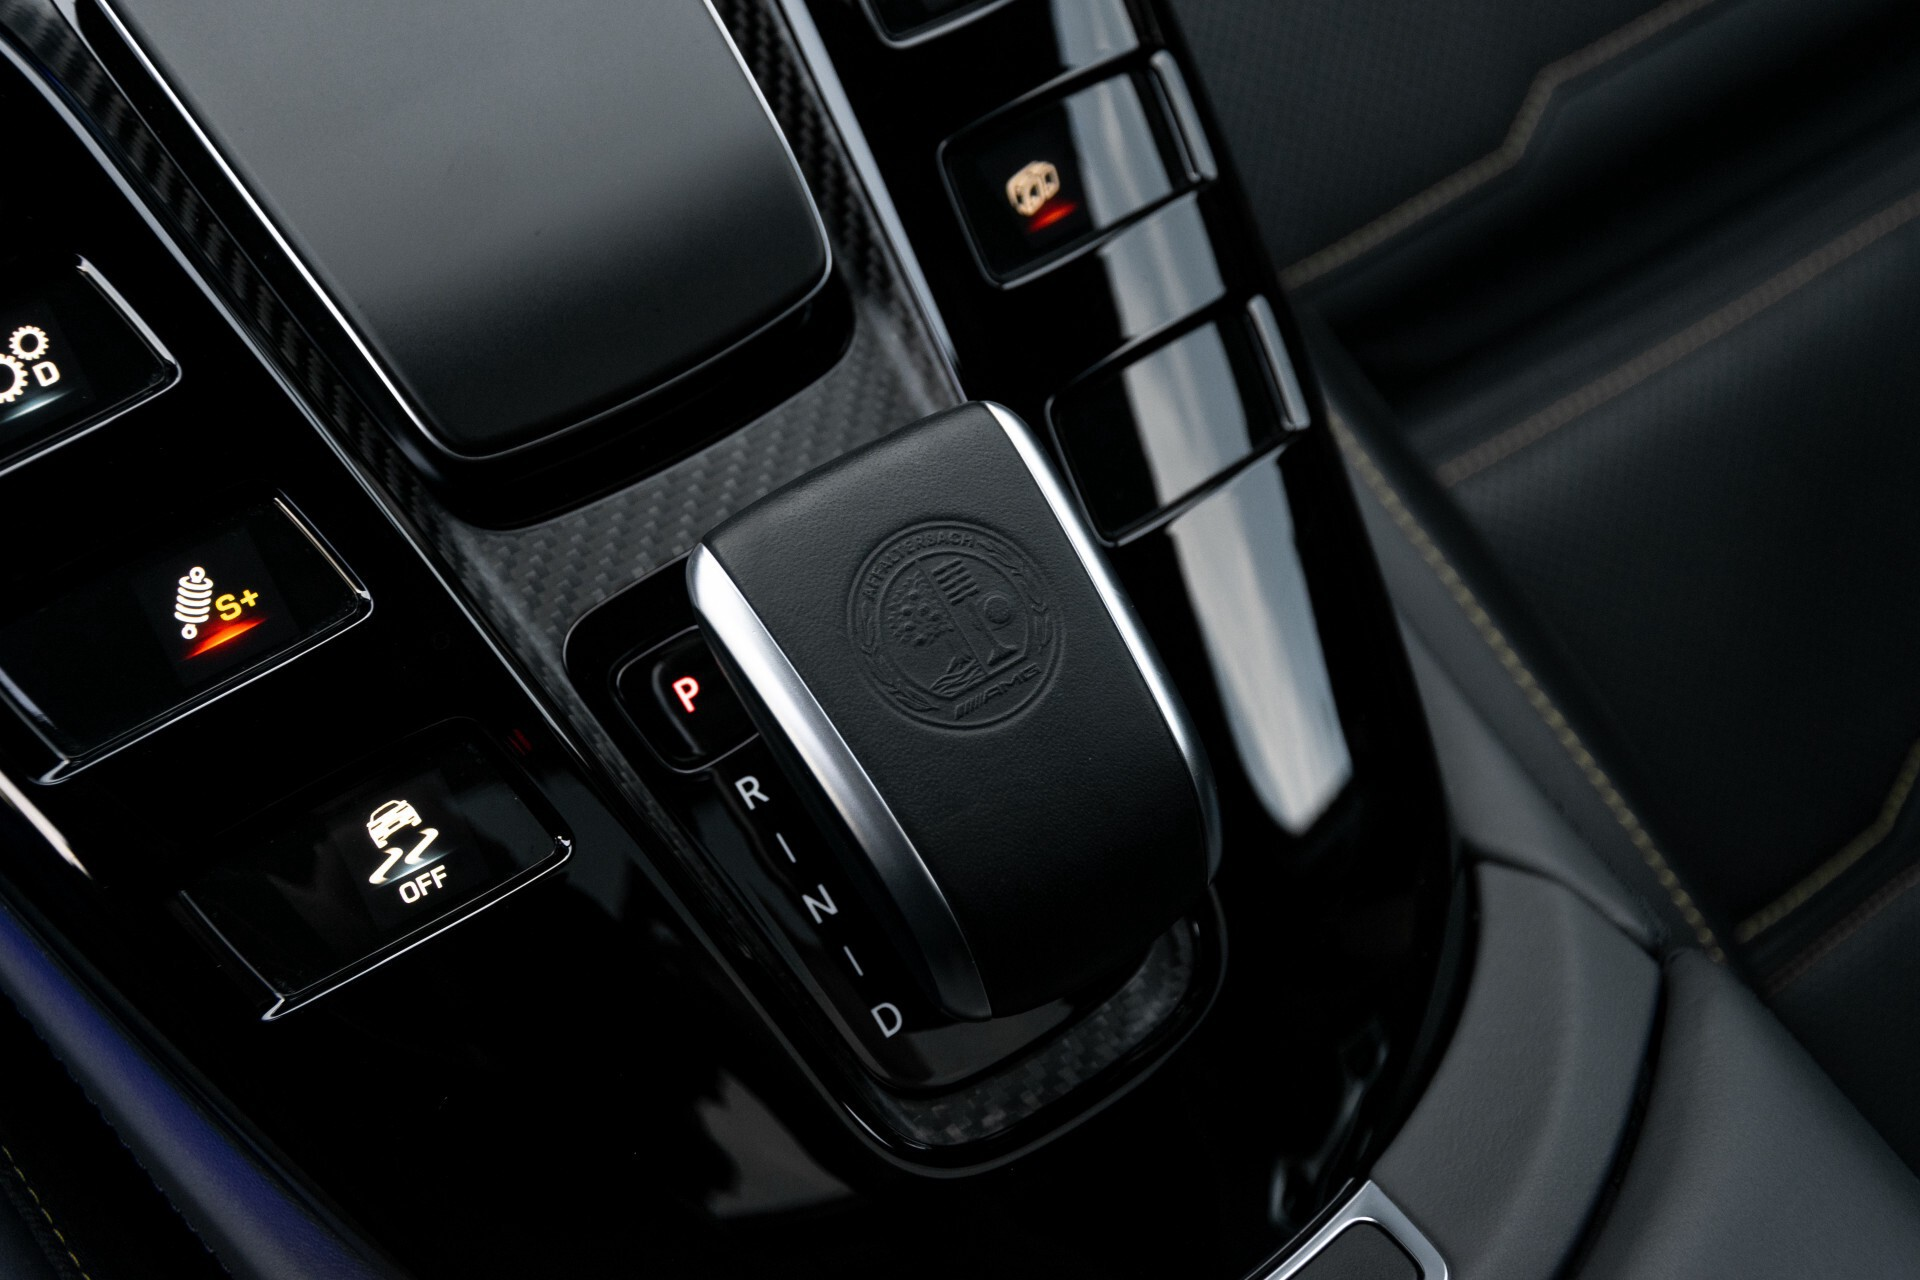 Mercedes-Benz AMG GT 4-Door Coupe 63 S 4MATIC+ Edition 1 Keramisch/Carbon/First Class/Dynamic Plus/Burmester High End 3D Aut9 Foto 58